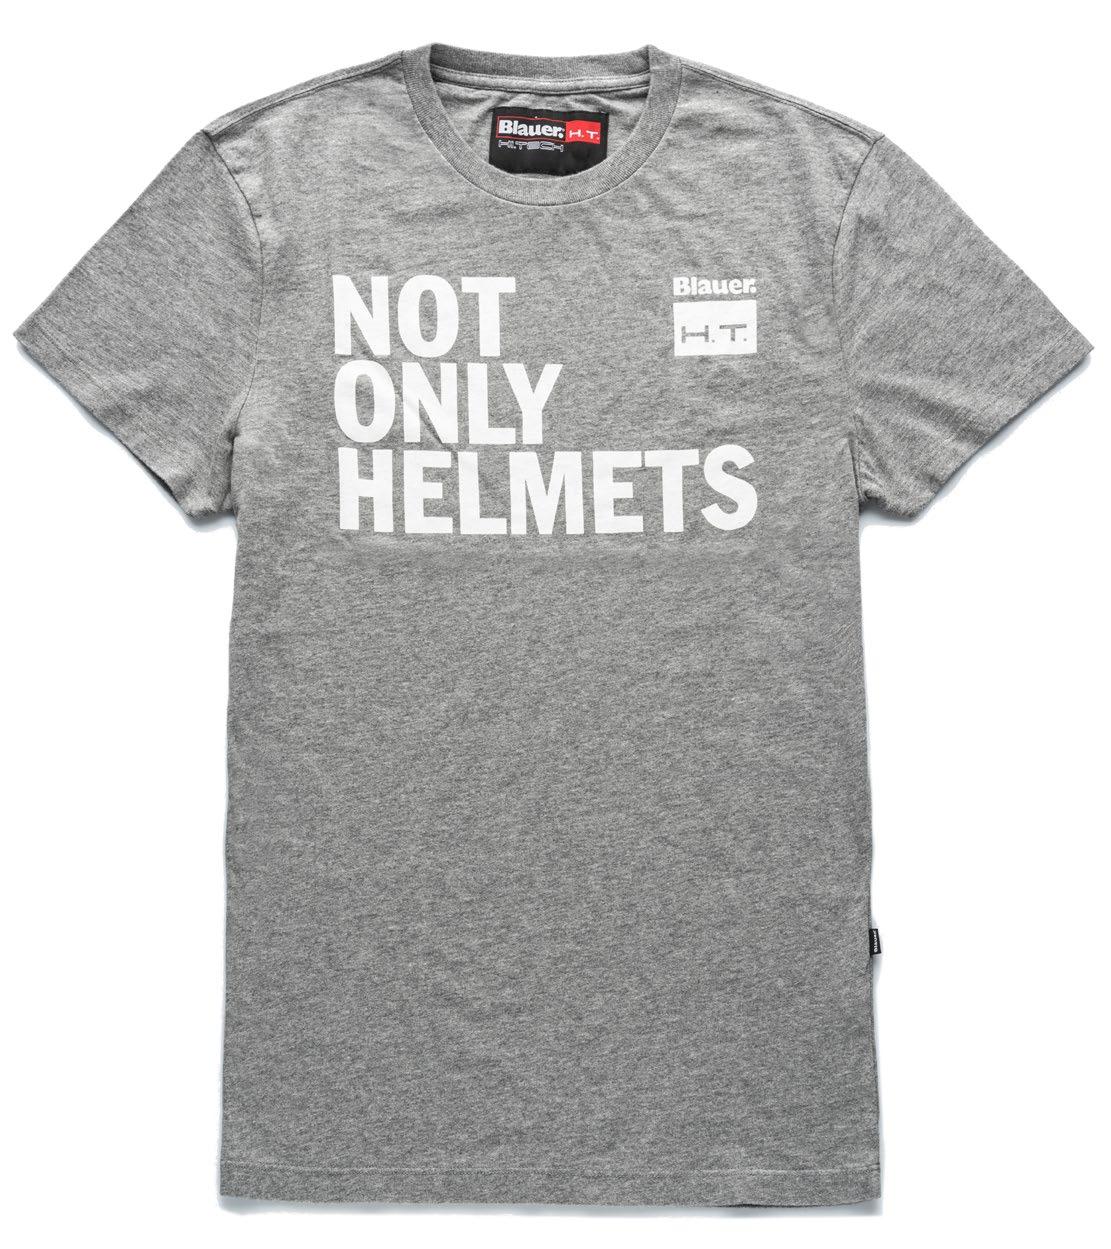 Футболка Blauer H.T. Not Only Helmets Серая